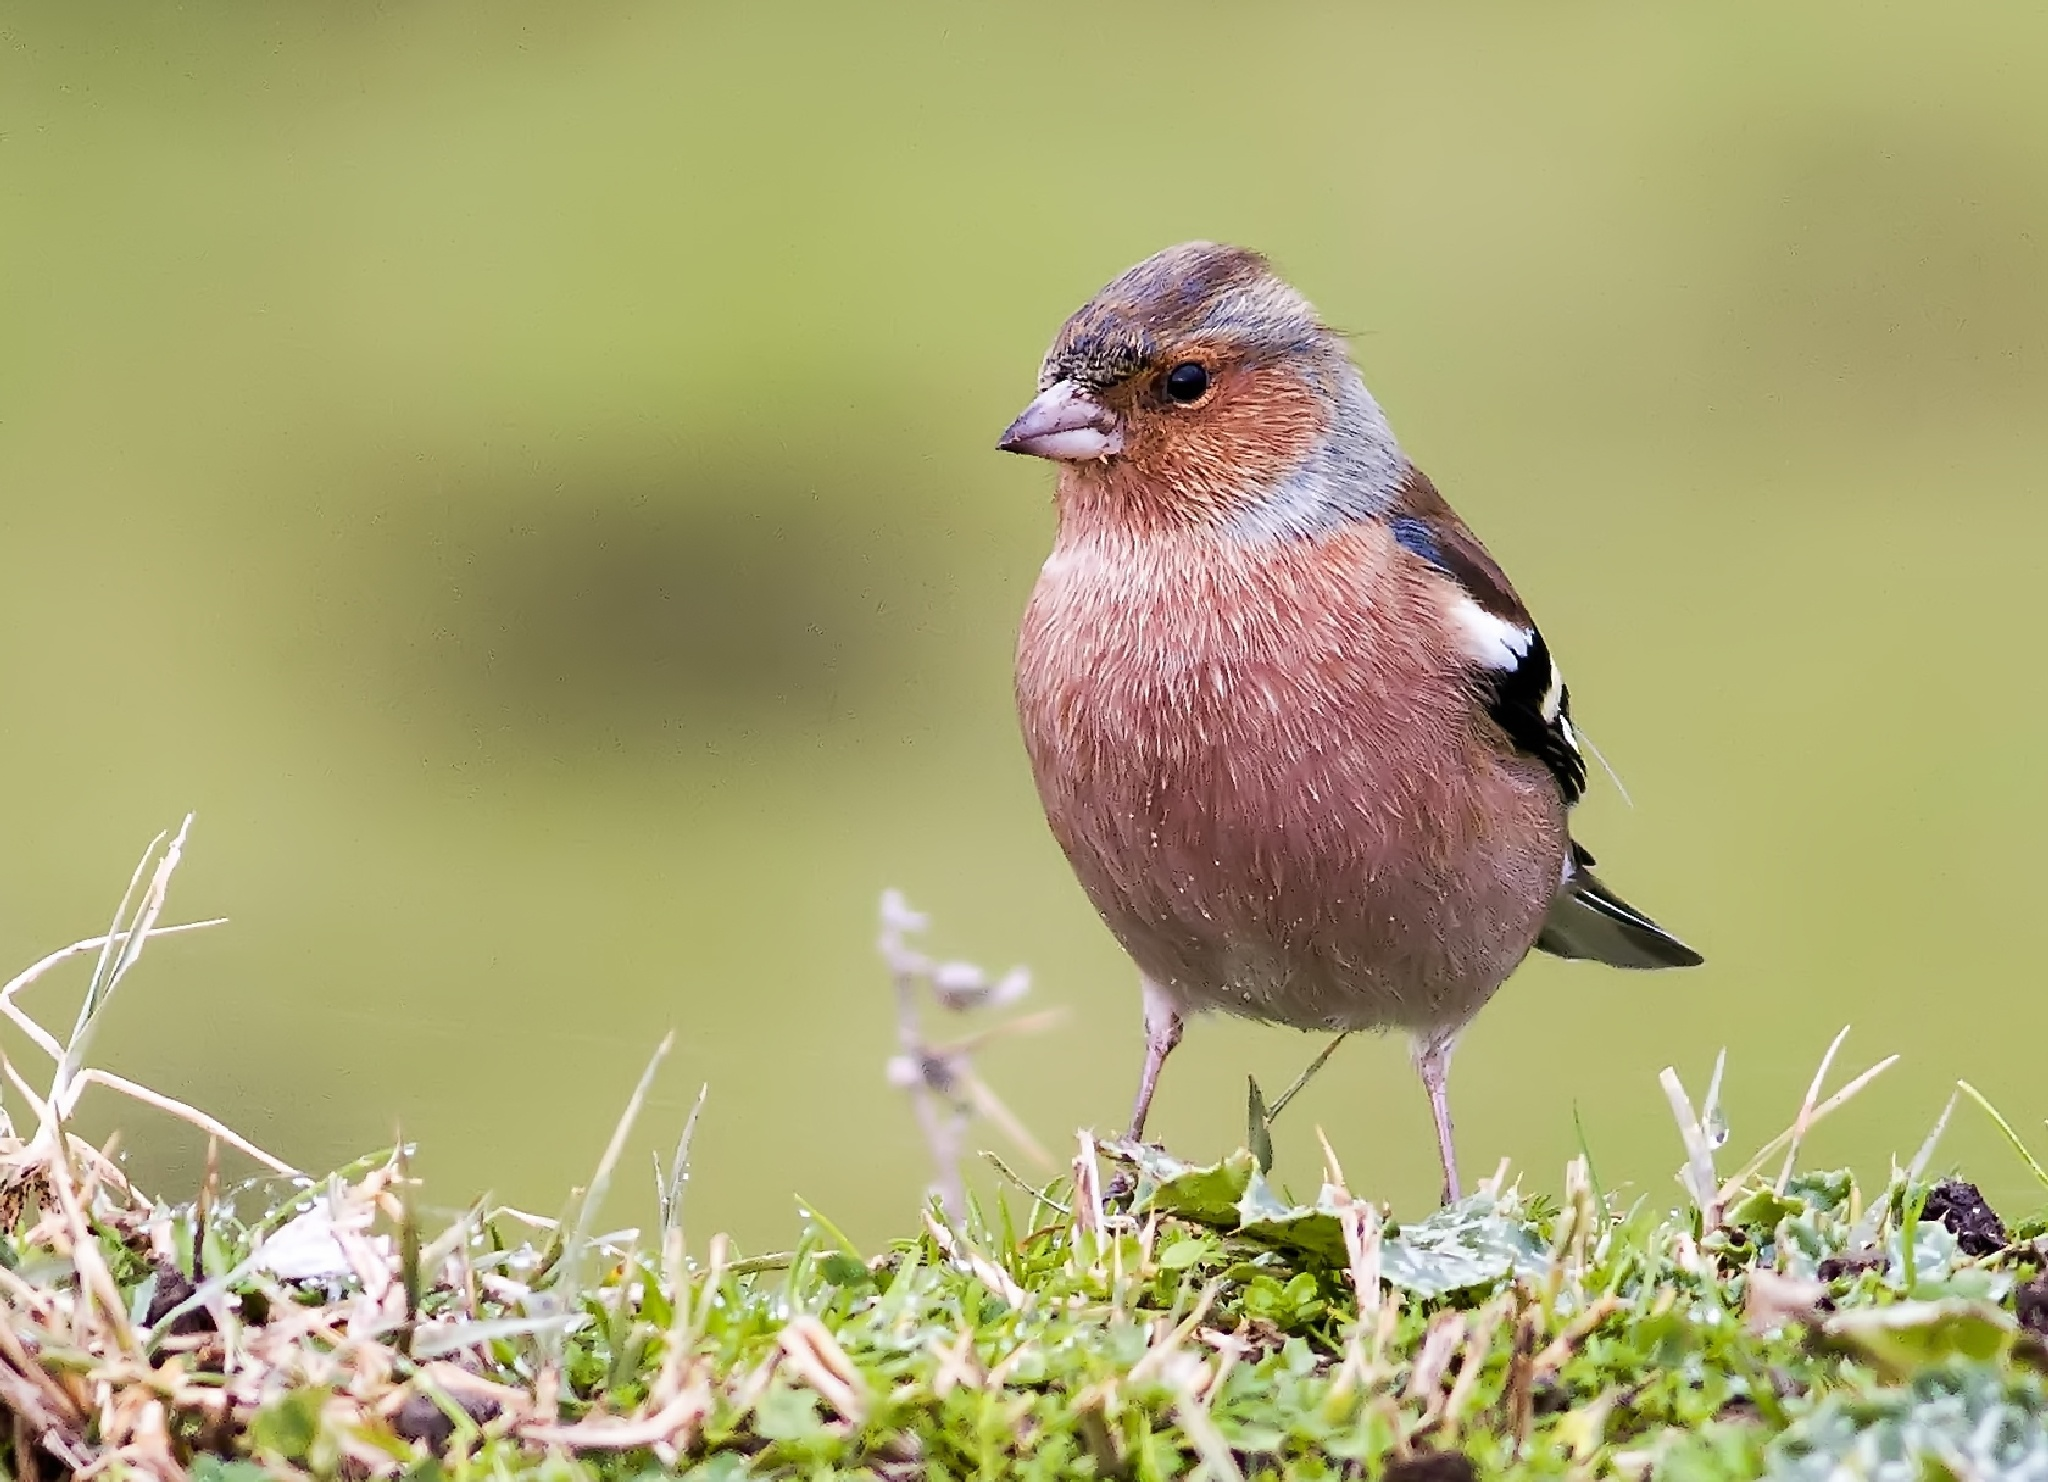 İspinoz -  Common Chaffinch - Fringilla coelebs by SOGUKPINAR